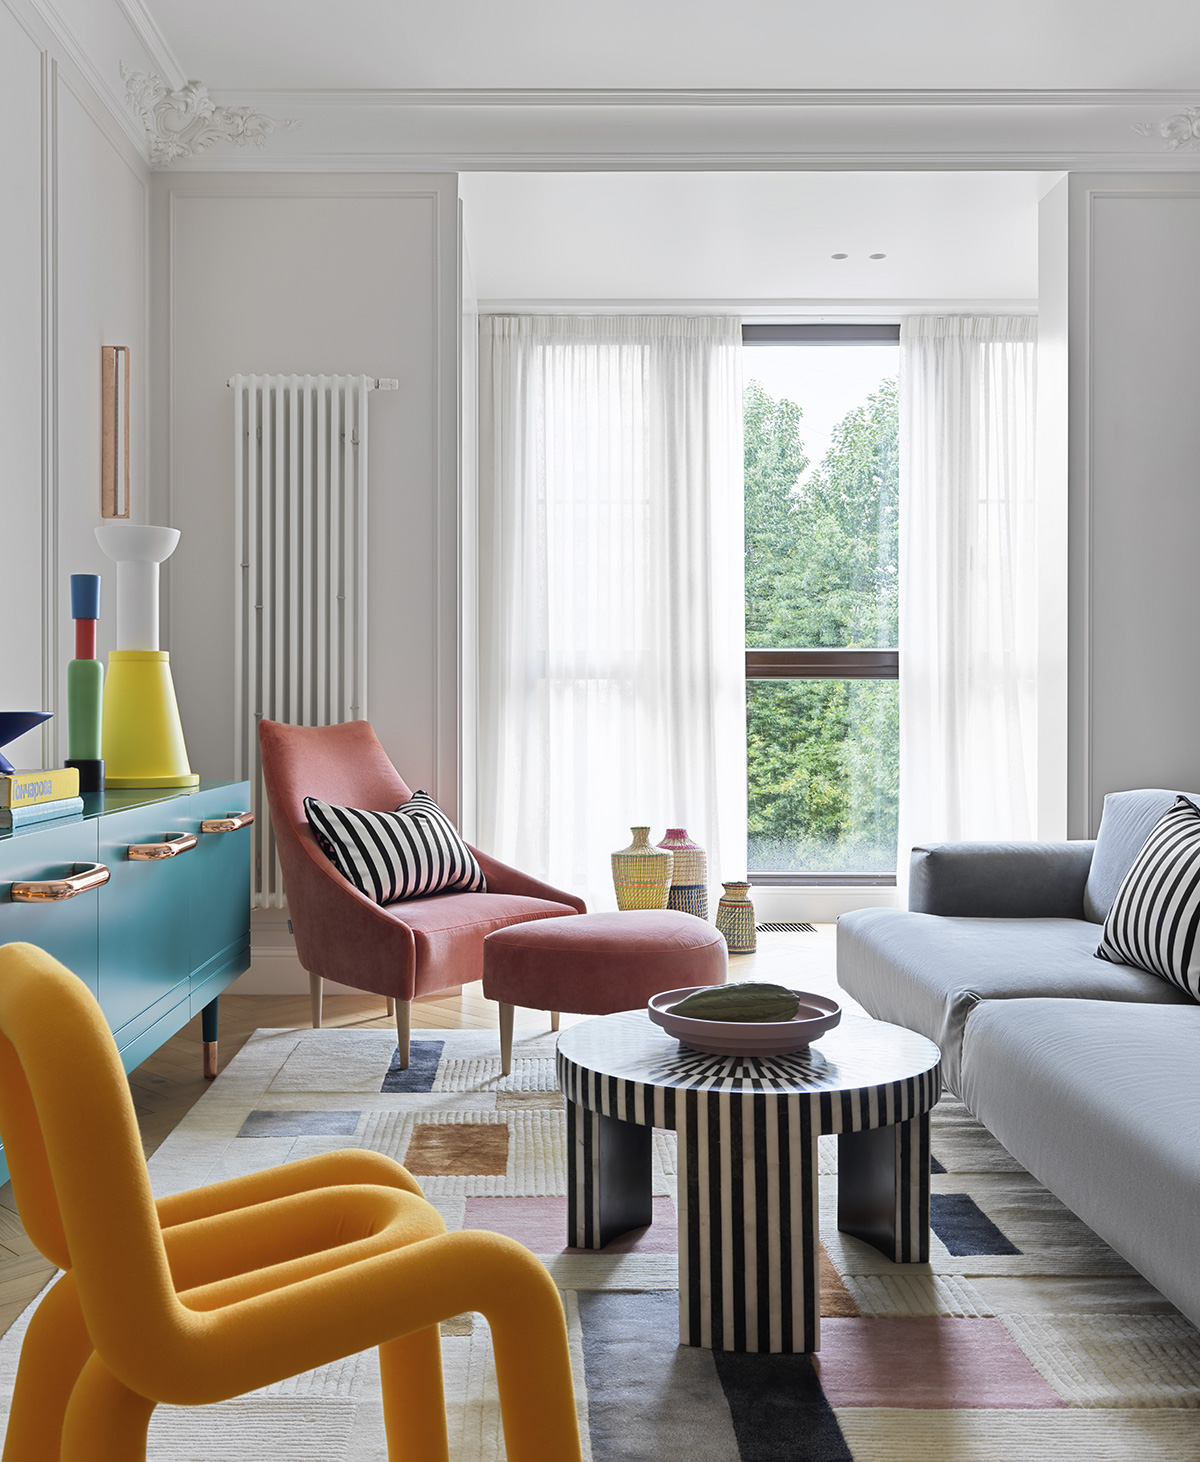 Apartamento parisino en Moscú